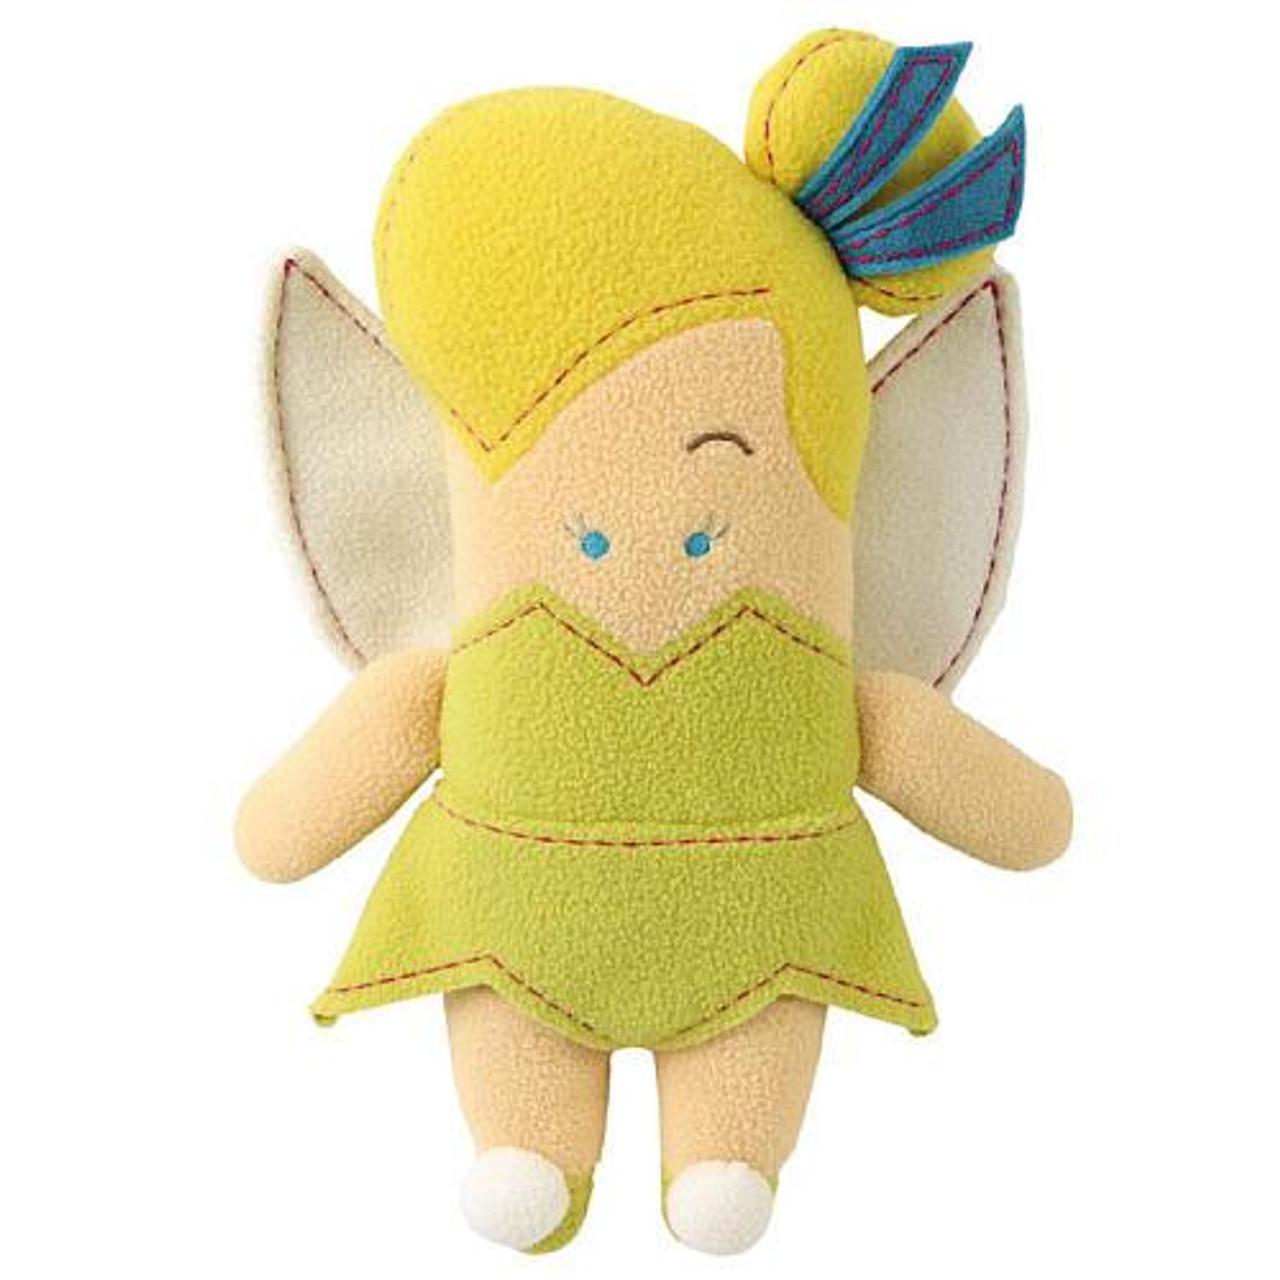 Disney Fairies Pook-a-Looz Tinker Bell Plush Doll